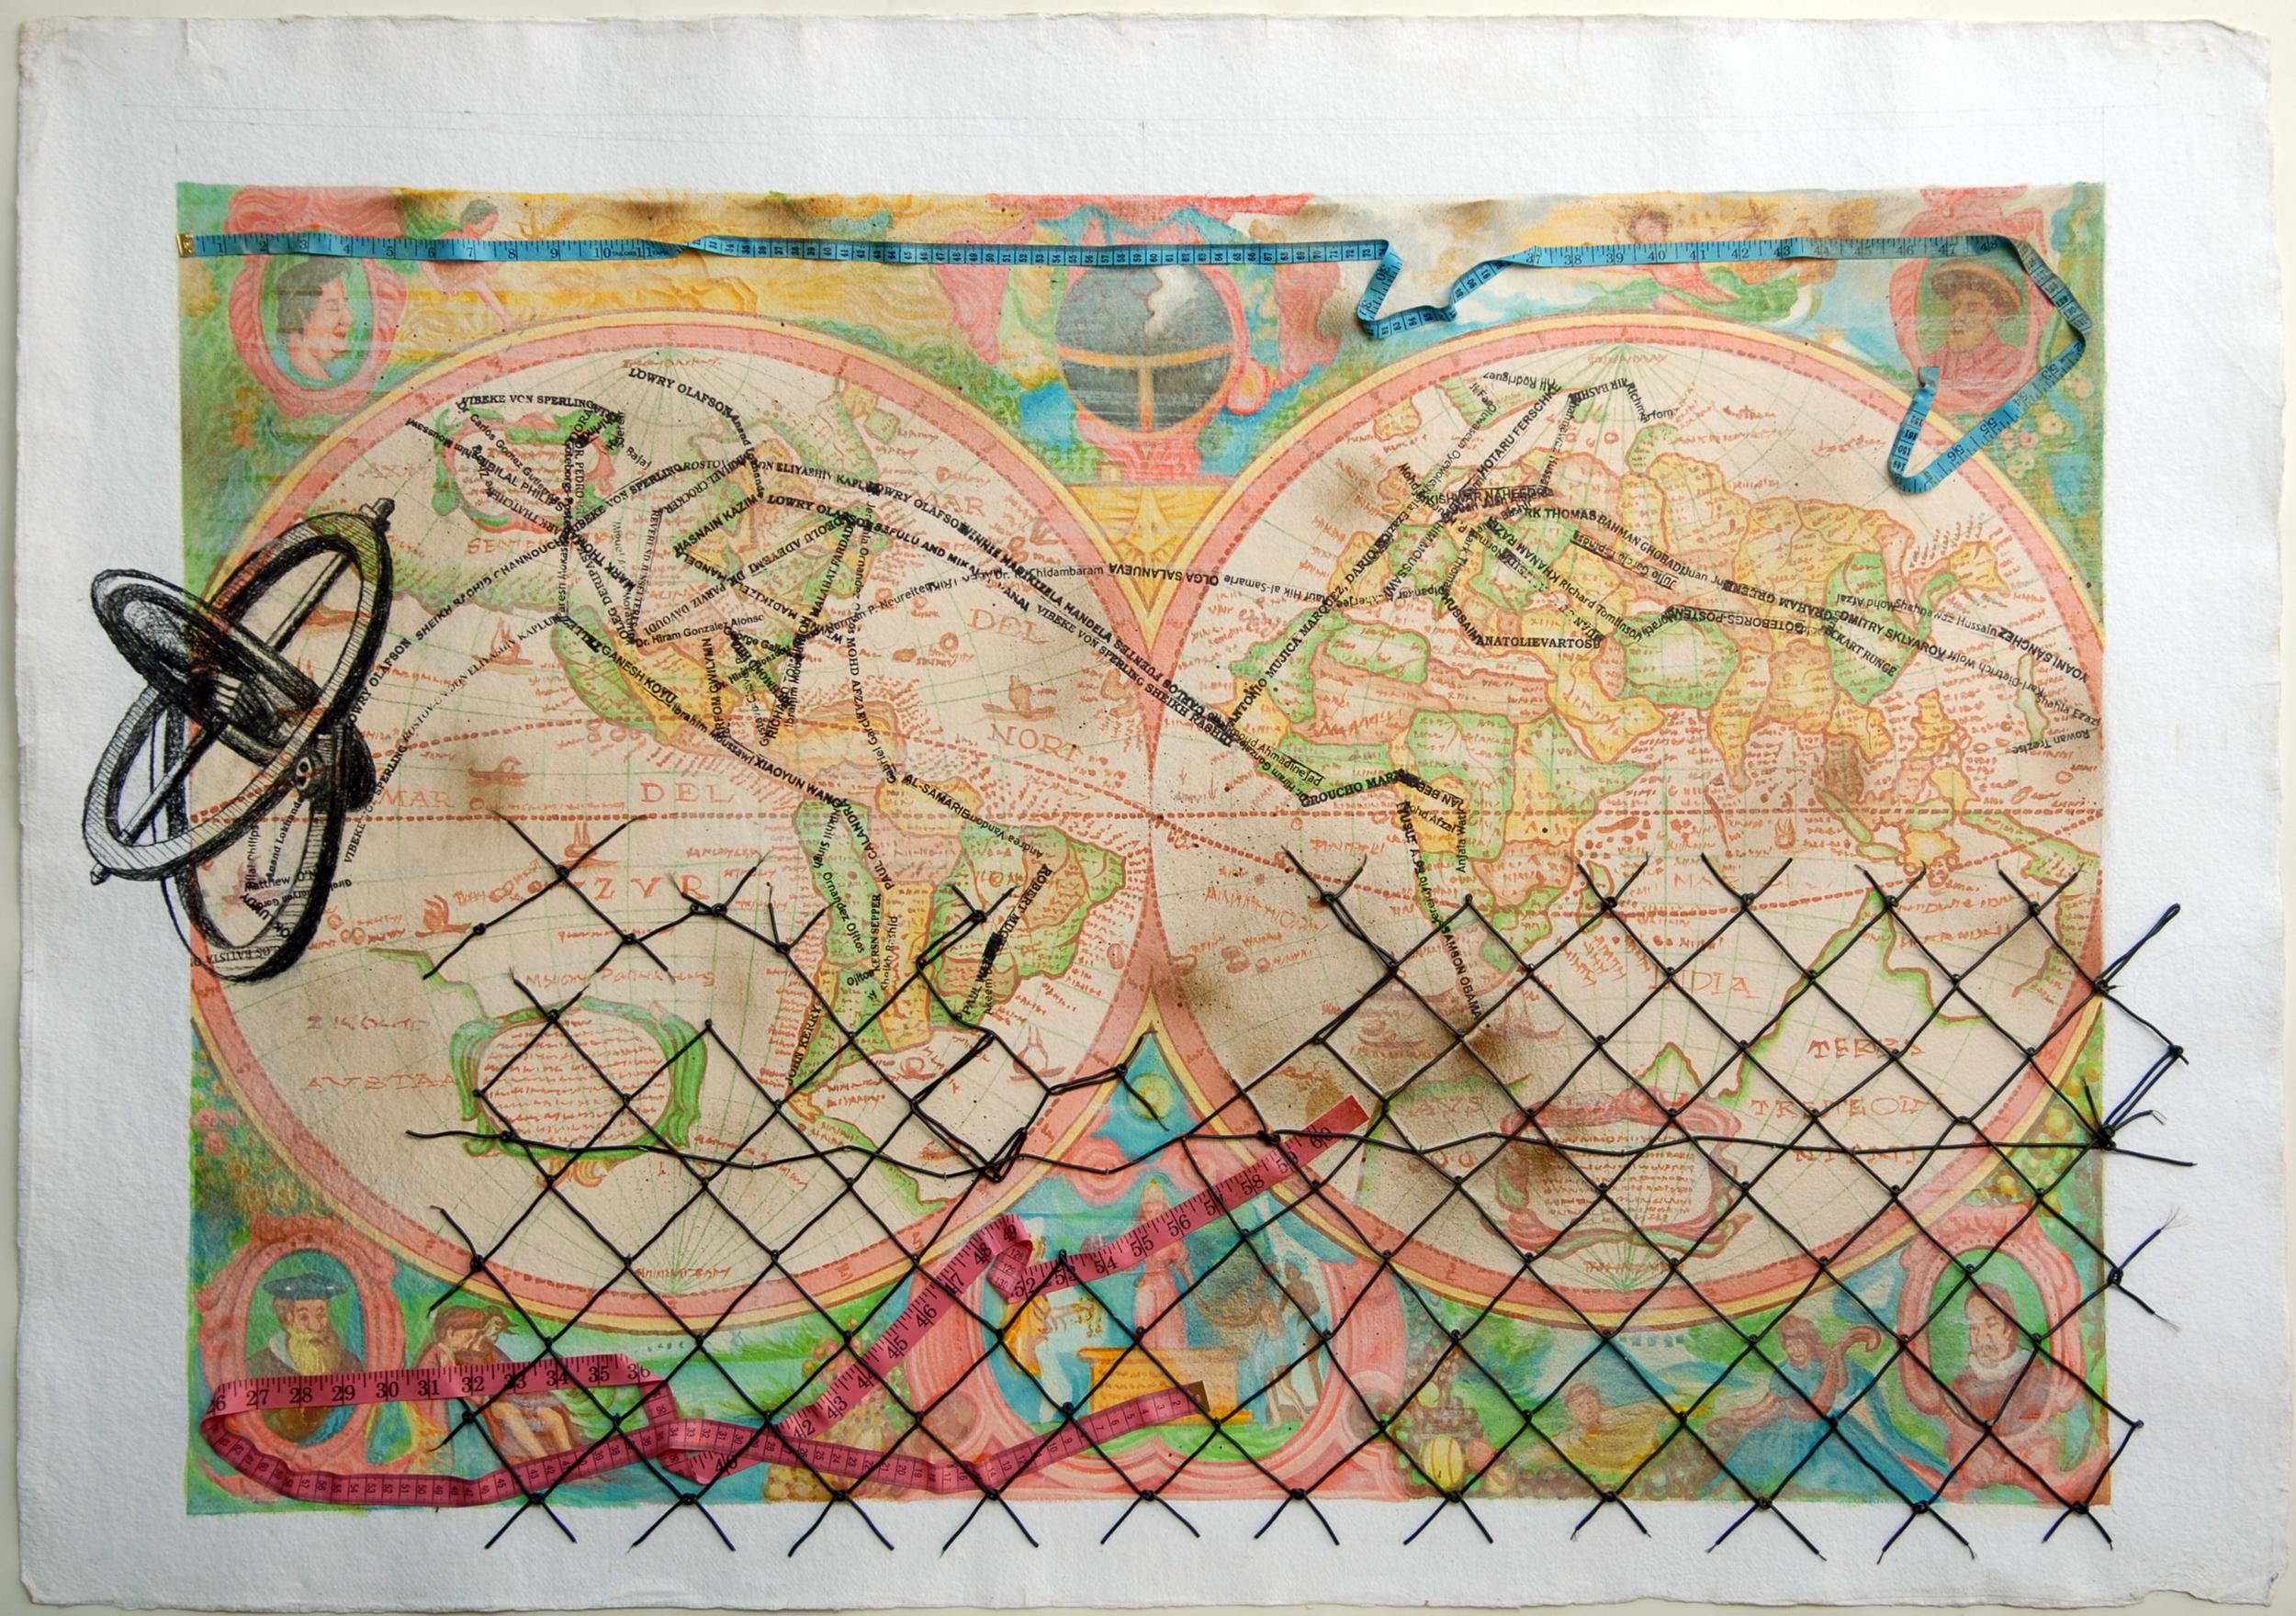 Reena Saini Kallat, Anatomy of Distance, 2013, mixed media on handmade paper